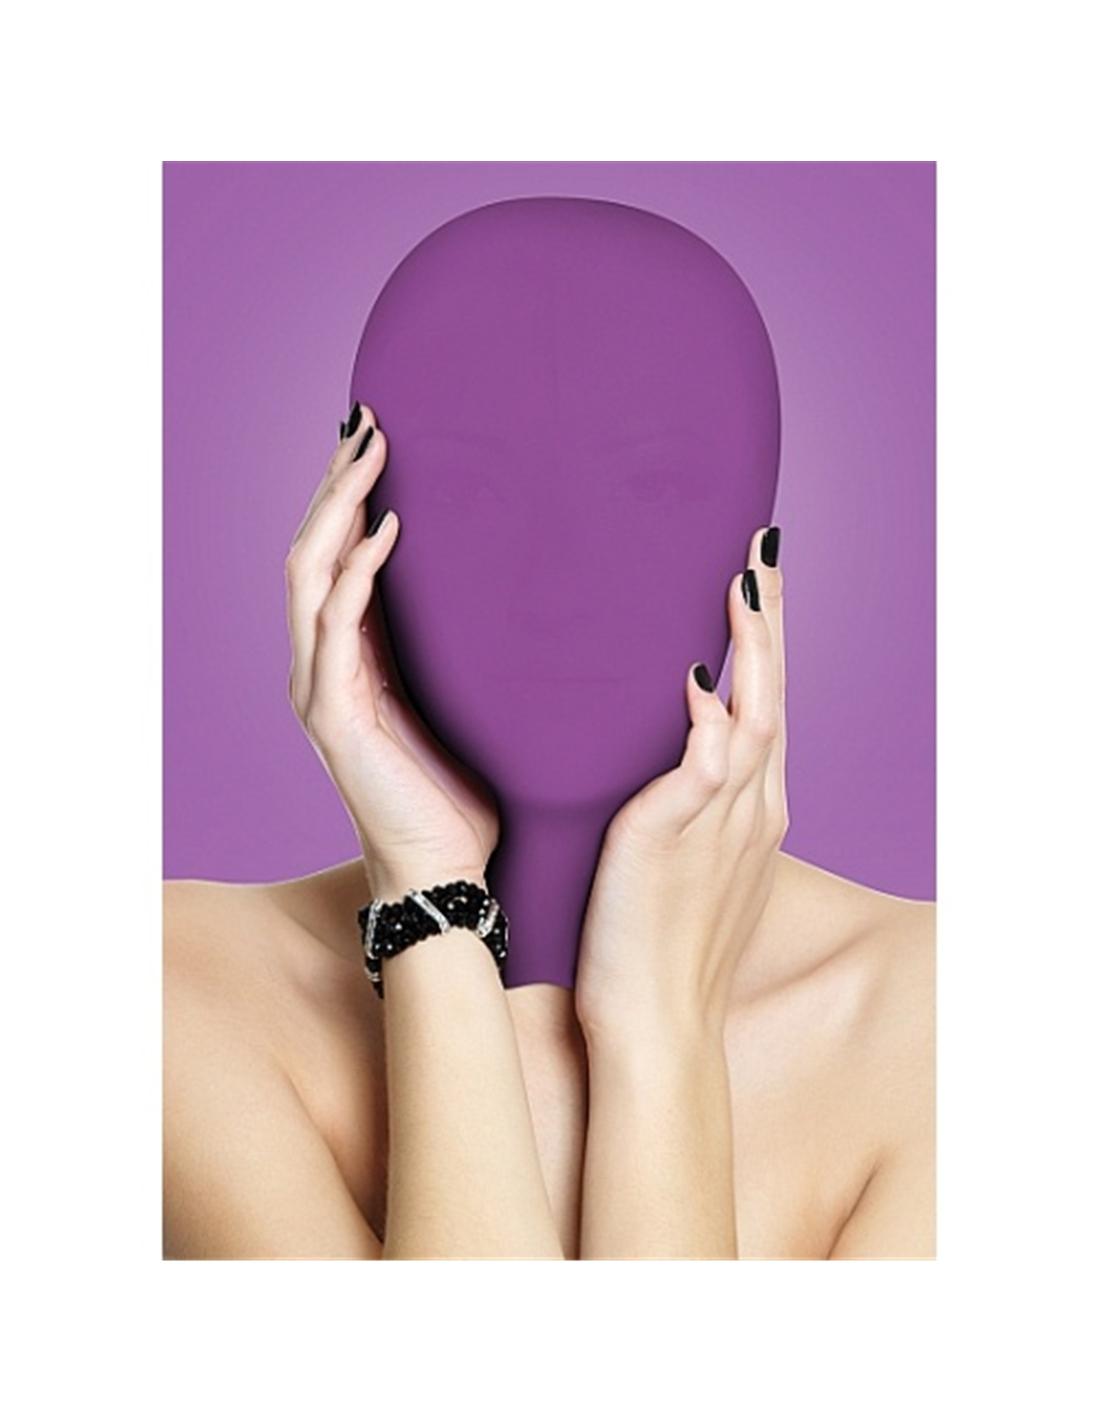 Máscara Subjugation Mask Roxa - PR2010320095